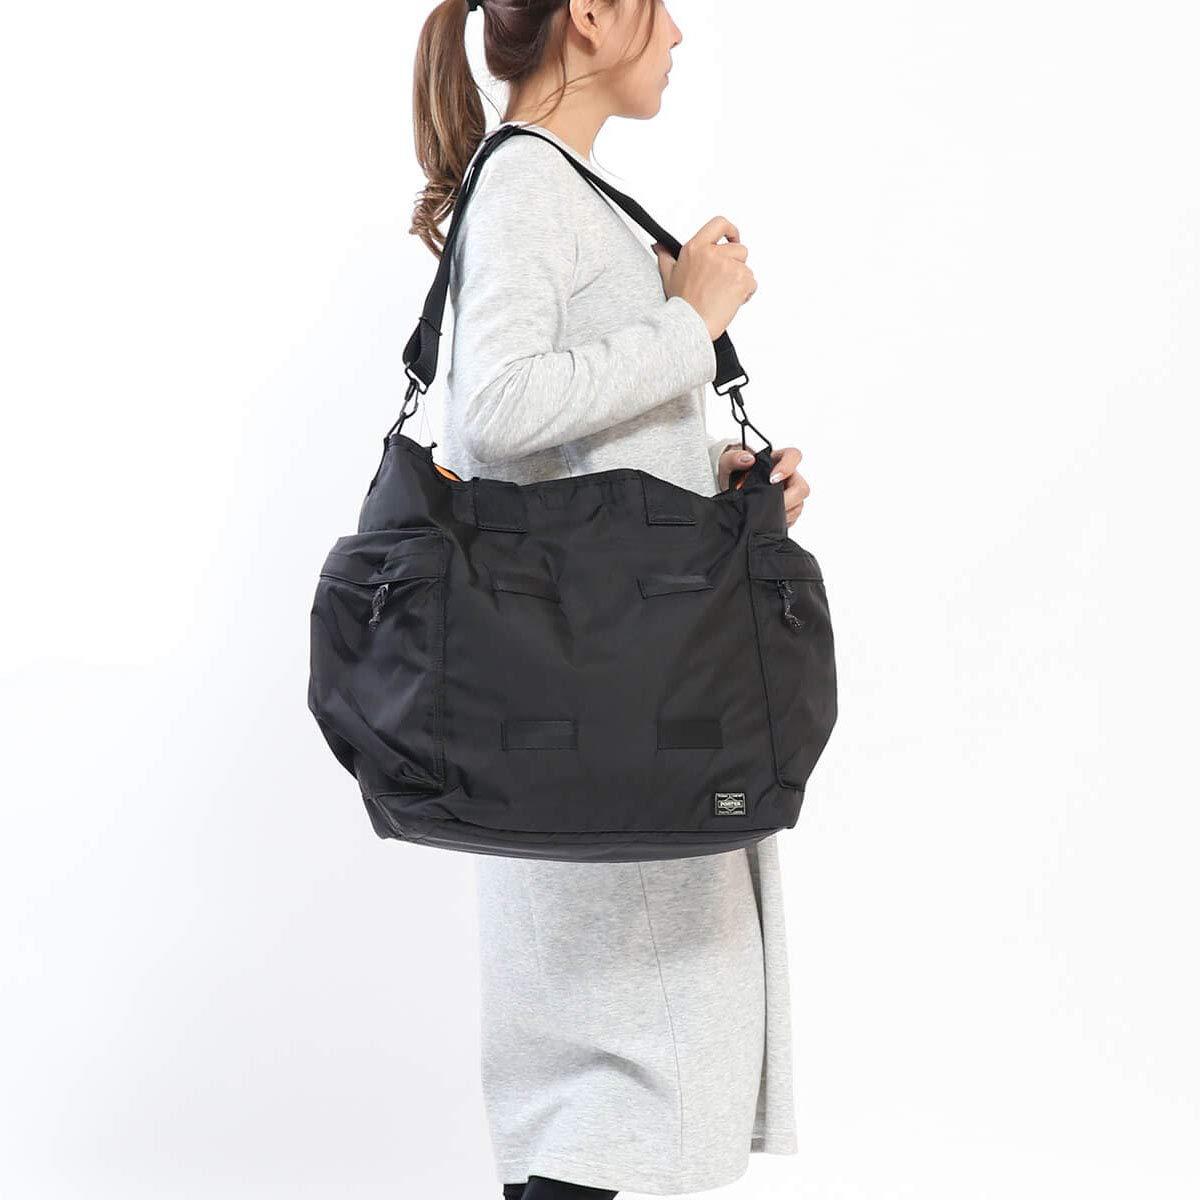 cdea7d118f8d Amazon | ポーター(porter)・フォース・2WAYトートバッグ (ブラック) | トートバッグ